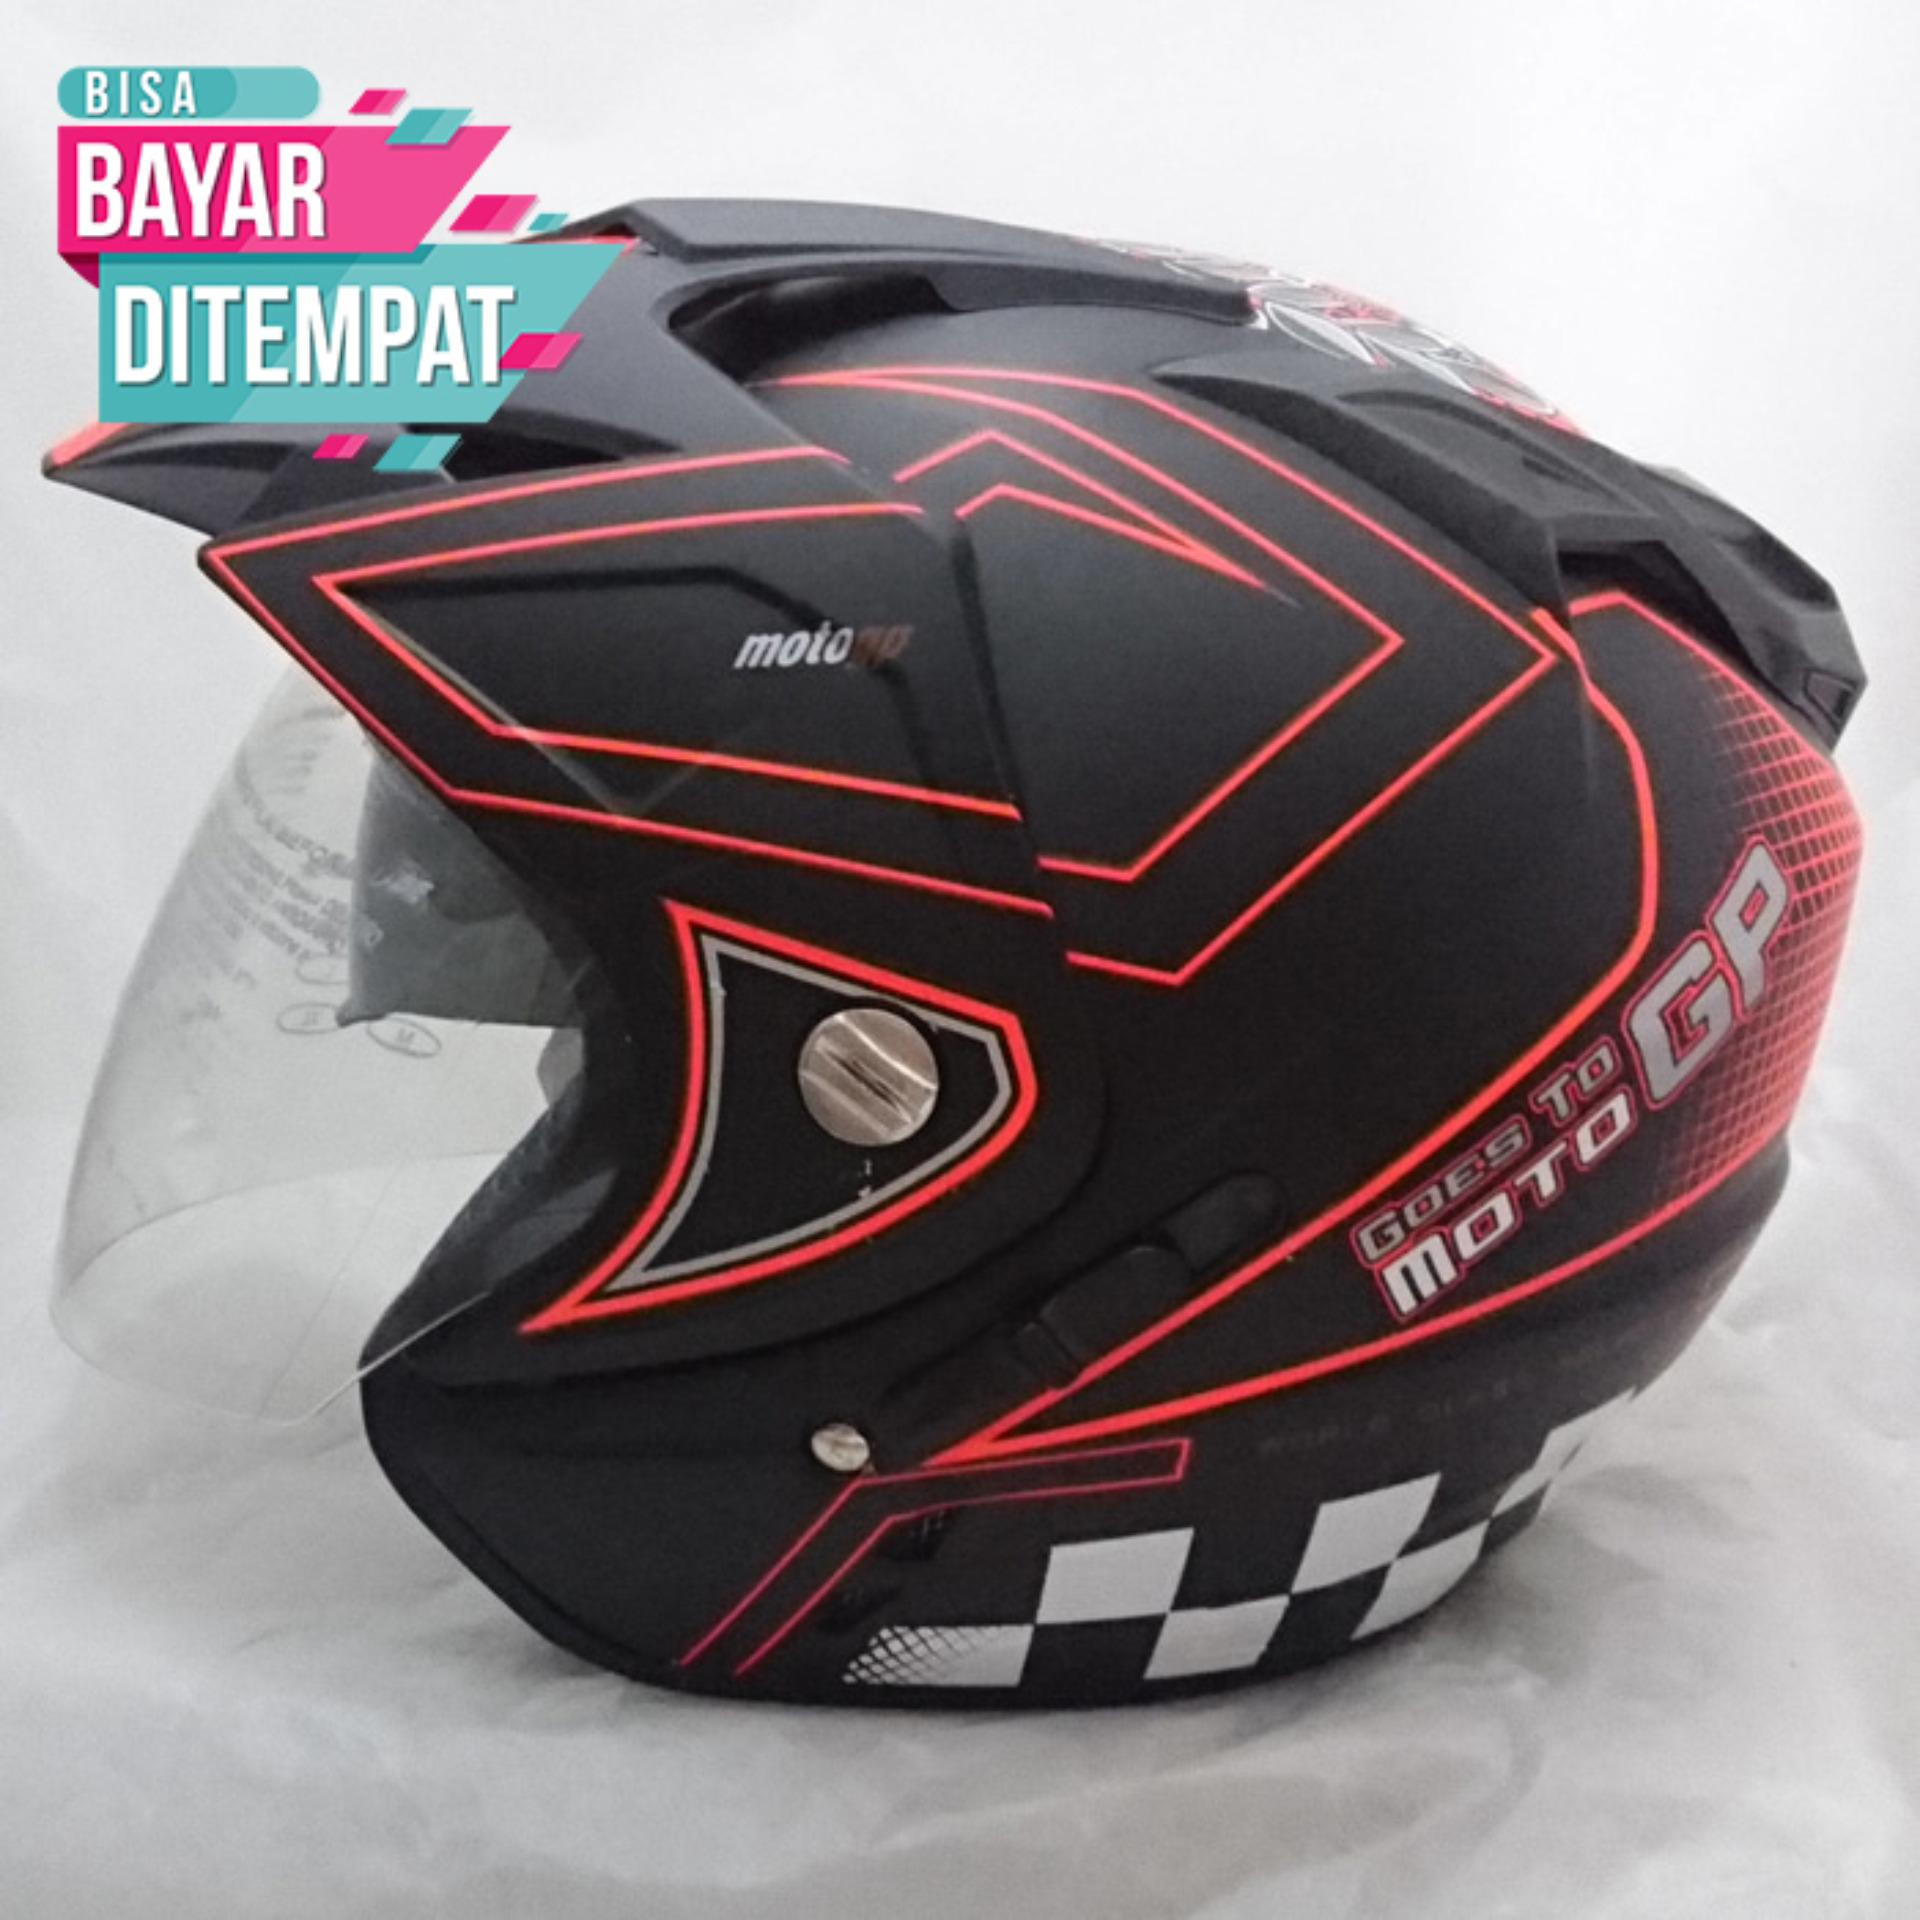 Helm Double Visor 2 Kaca DMN Moto GP Black Red